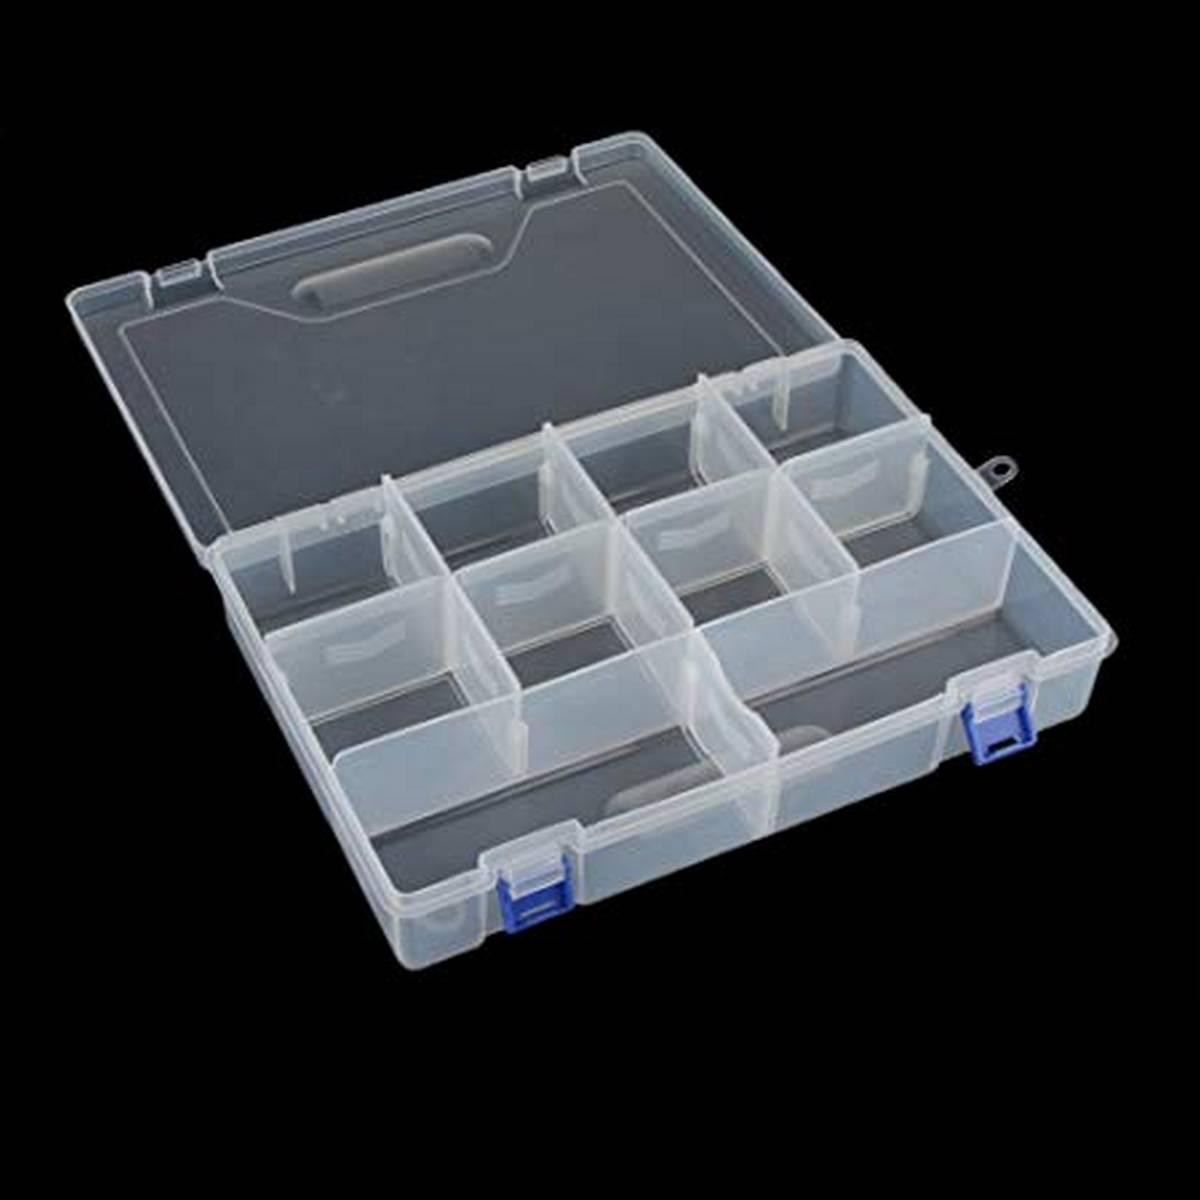 RC Model Santus G-300 F-300 Component Box Sundries Box Parts Box Storage Box G300 F300